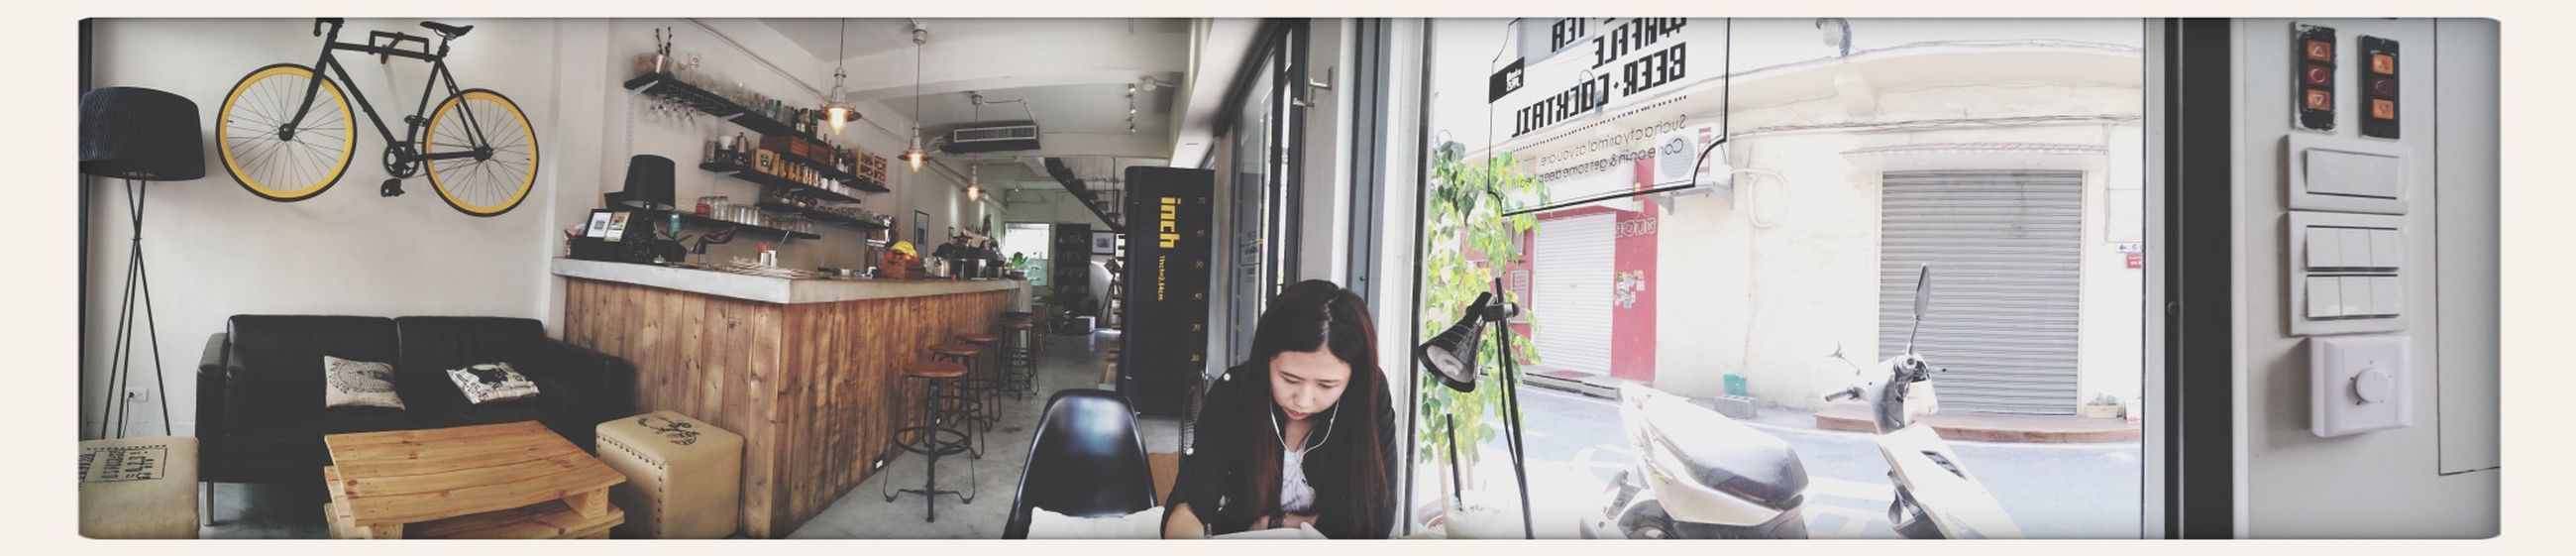 Studying Waffle Coffee Afternoon Tea